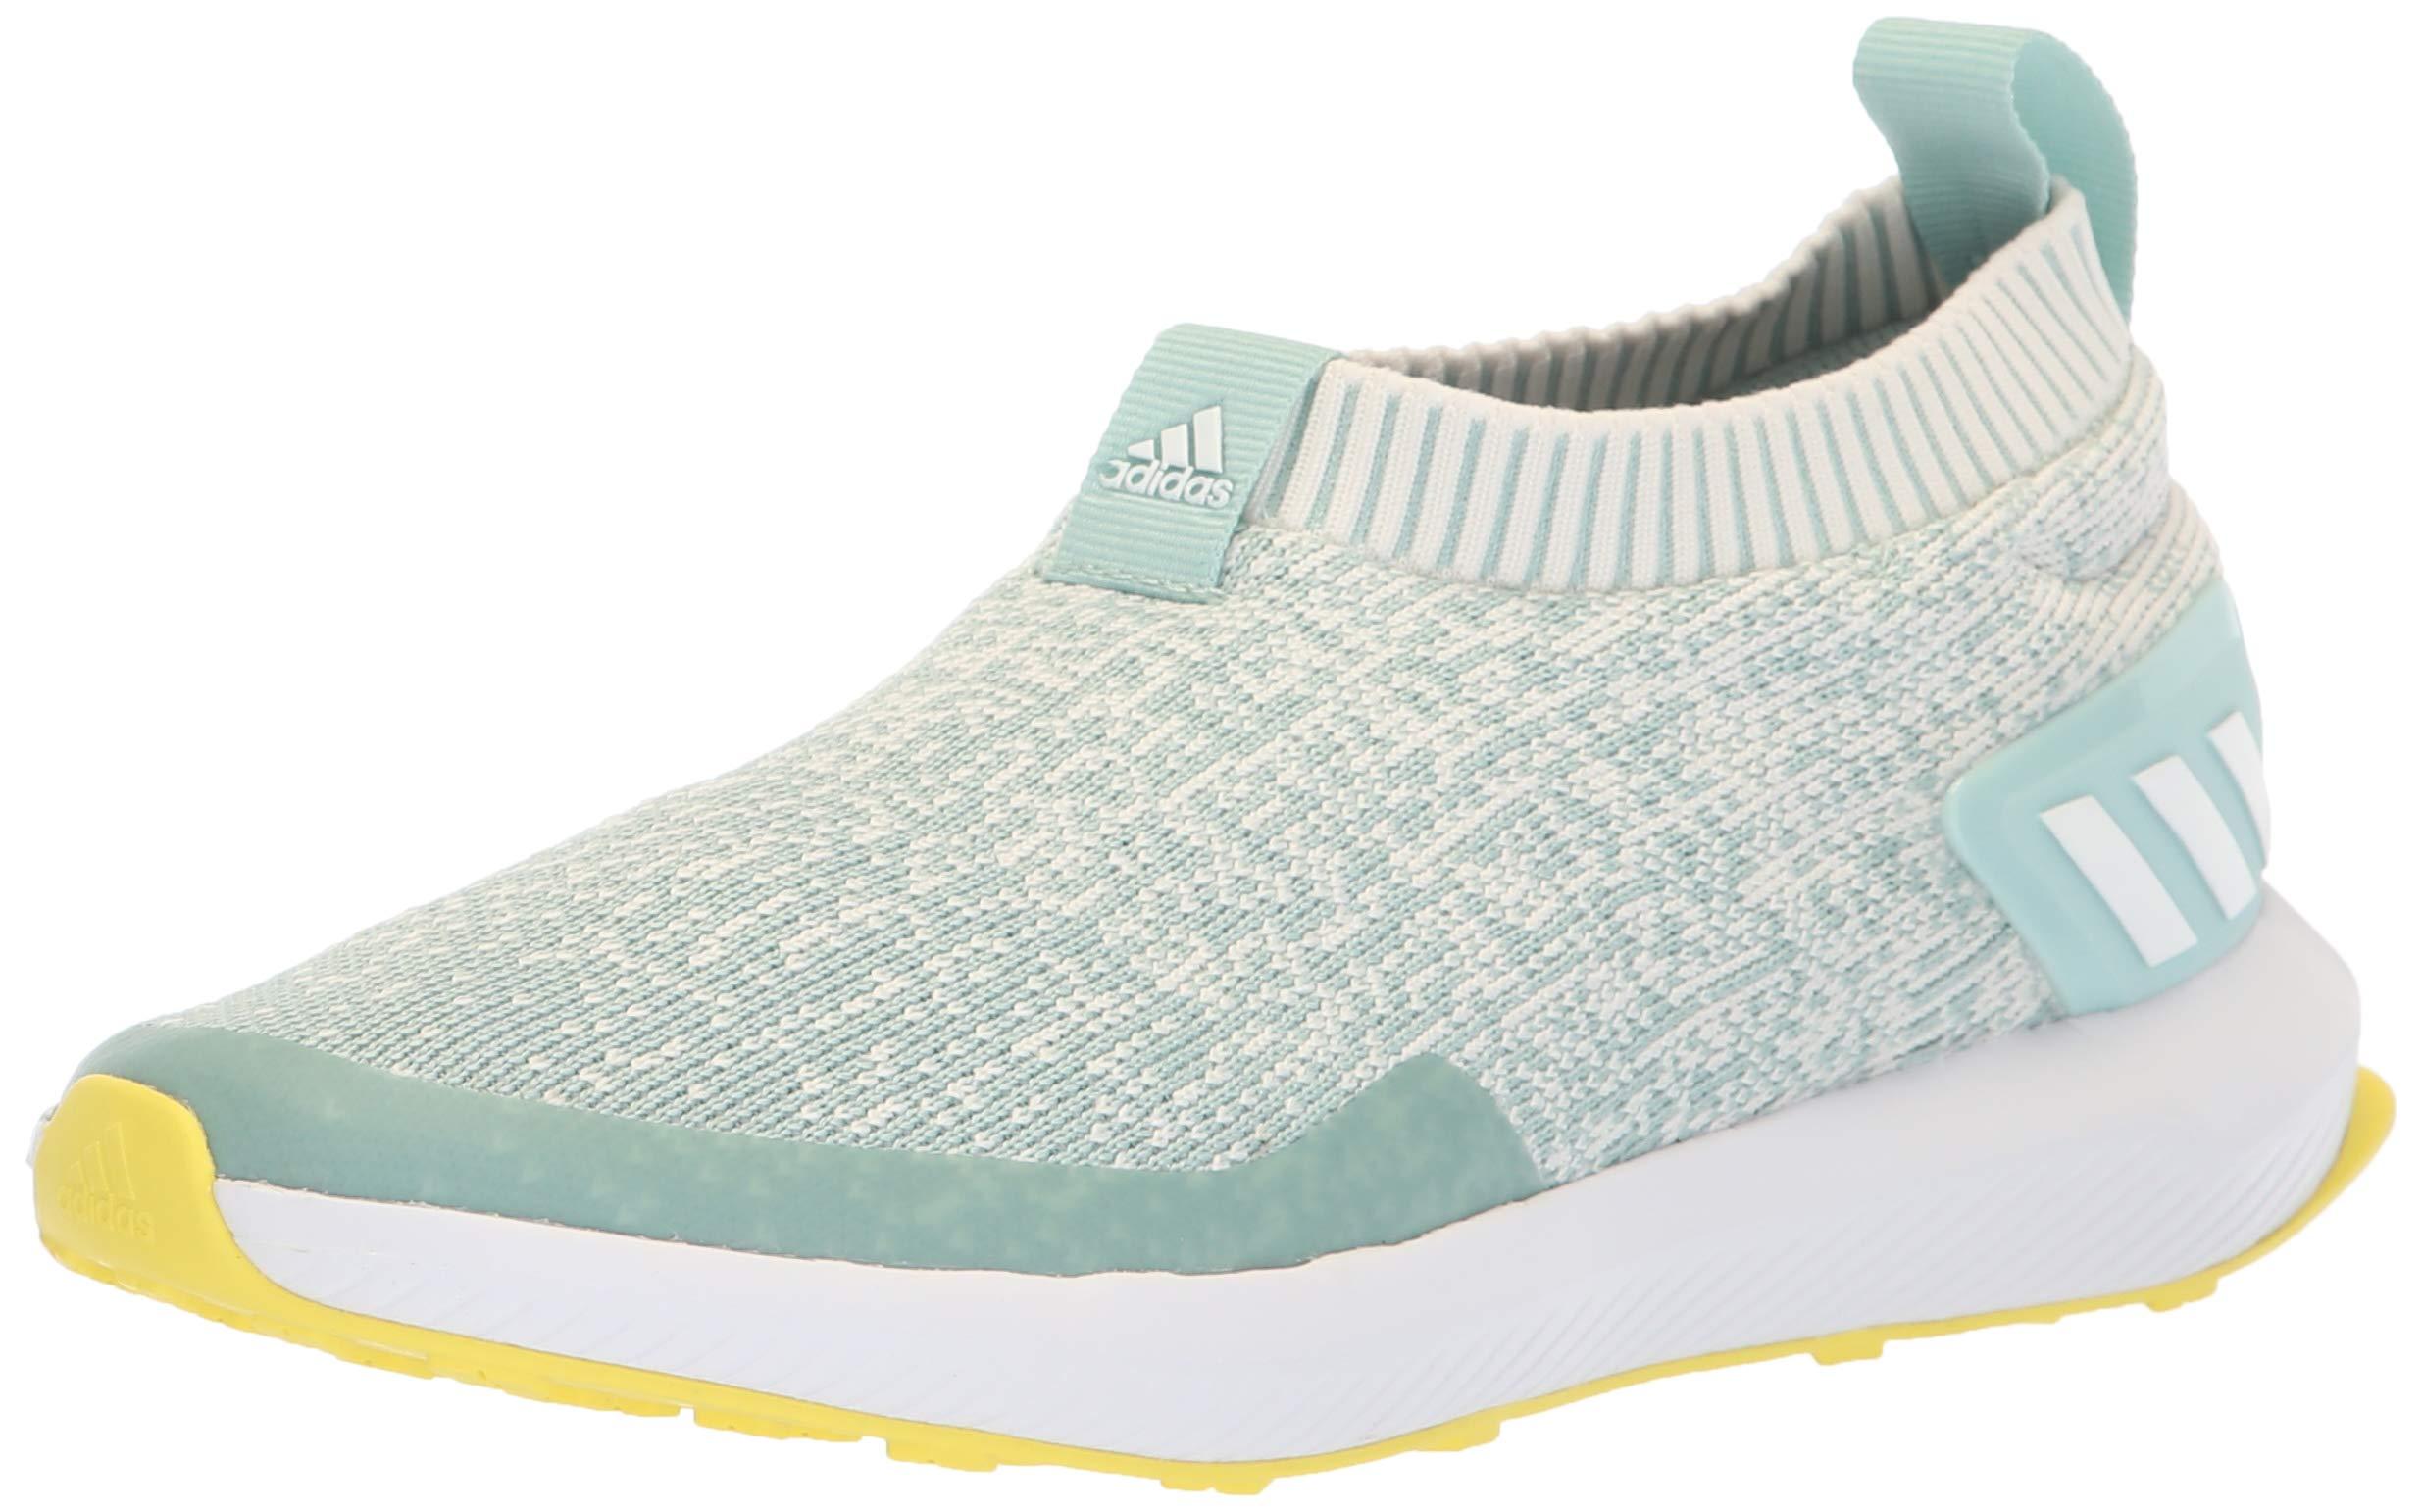 aee1d6310e adidas Unisex RapidaRun Laceless Knit Running Shoe, ash Green/Chalk  White/Shock Yellow, 6.5 M US Big Kid